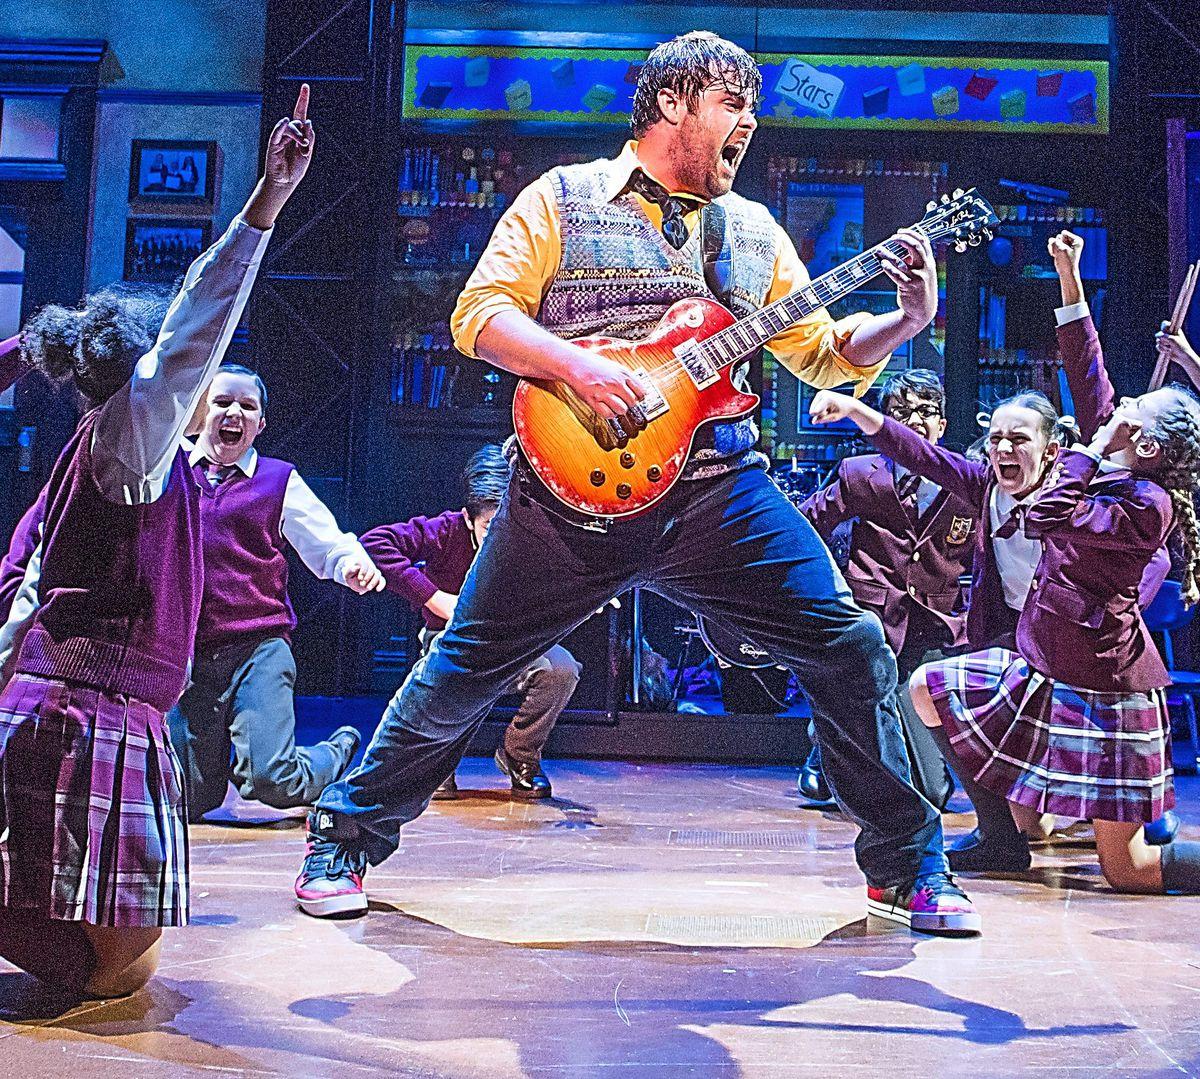 School of Rock is coming to Wolverhampton Grand Theatre in September